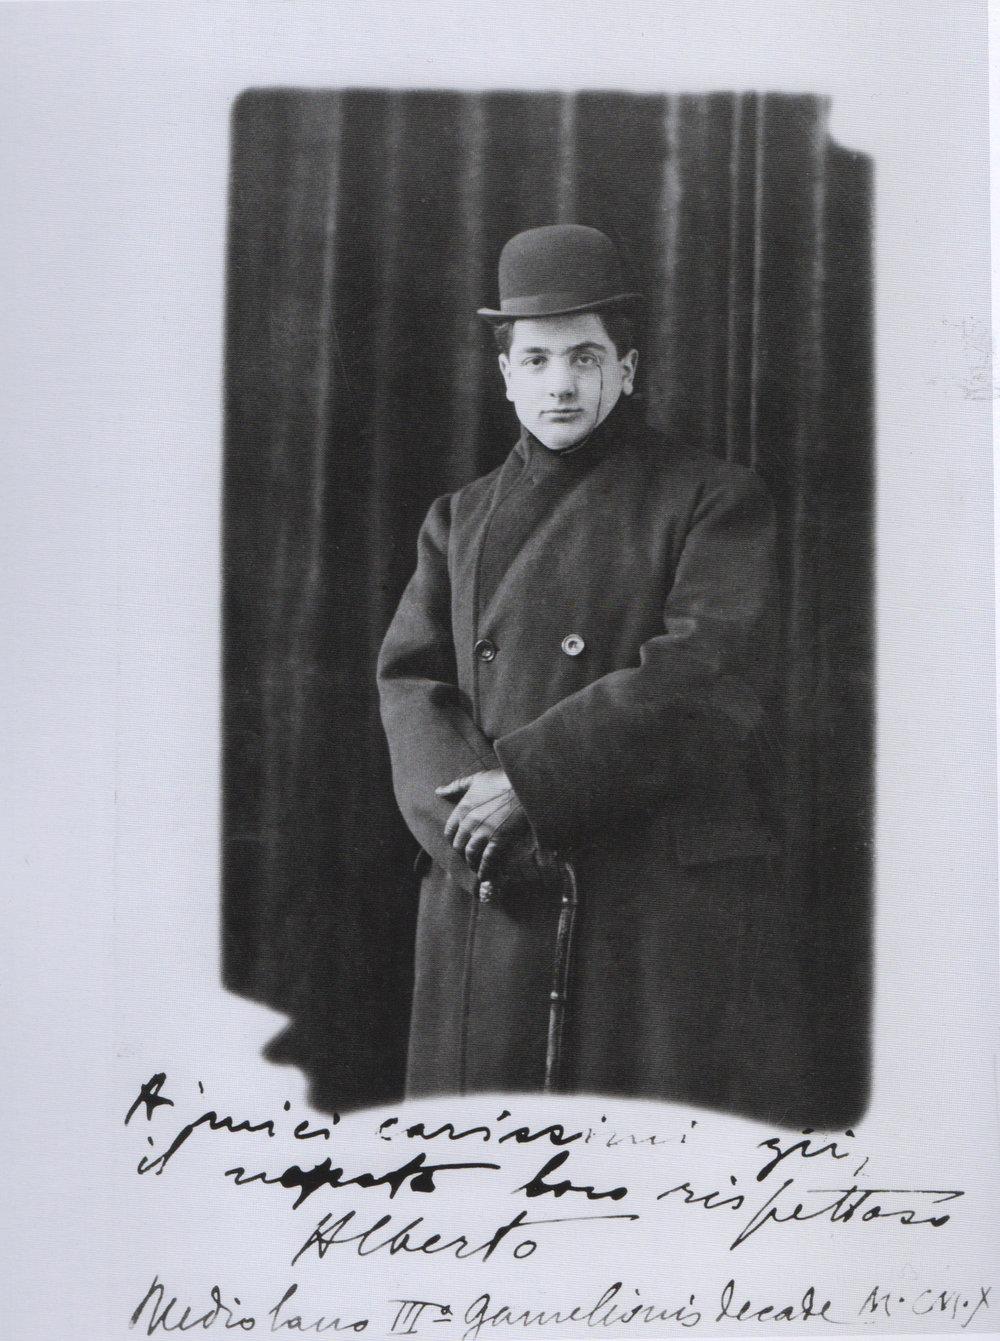 Alberto Savinio, Milan, 1910